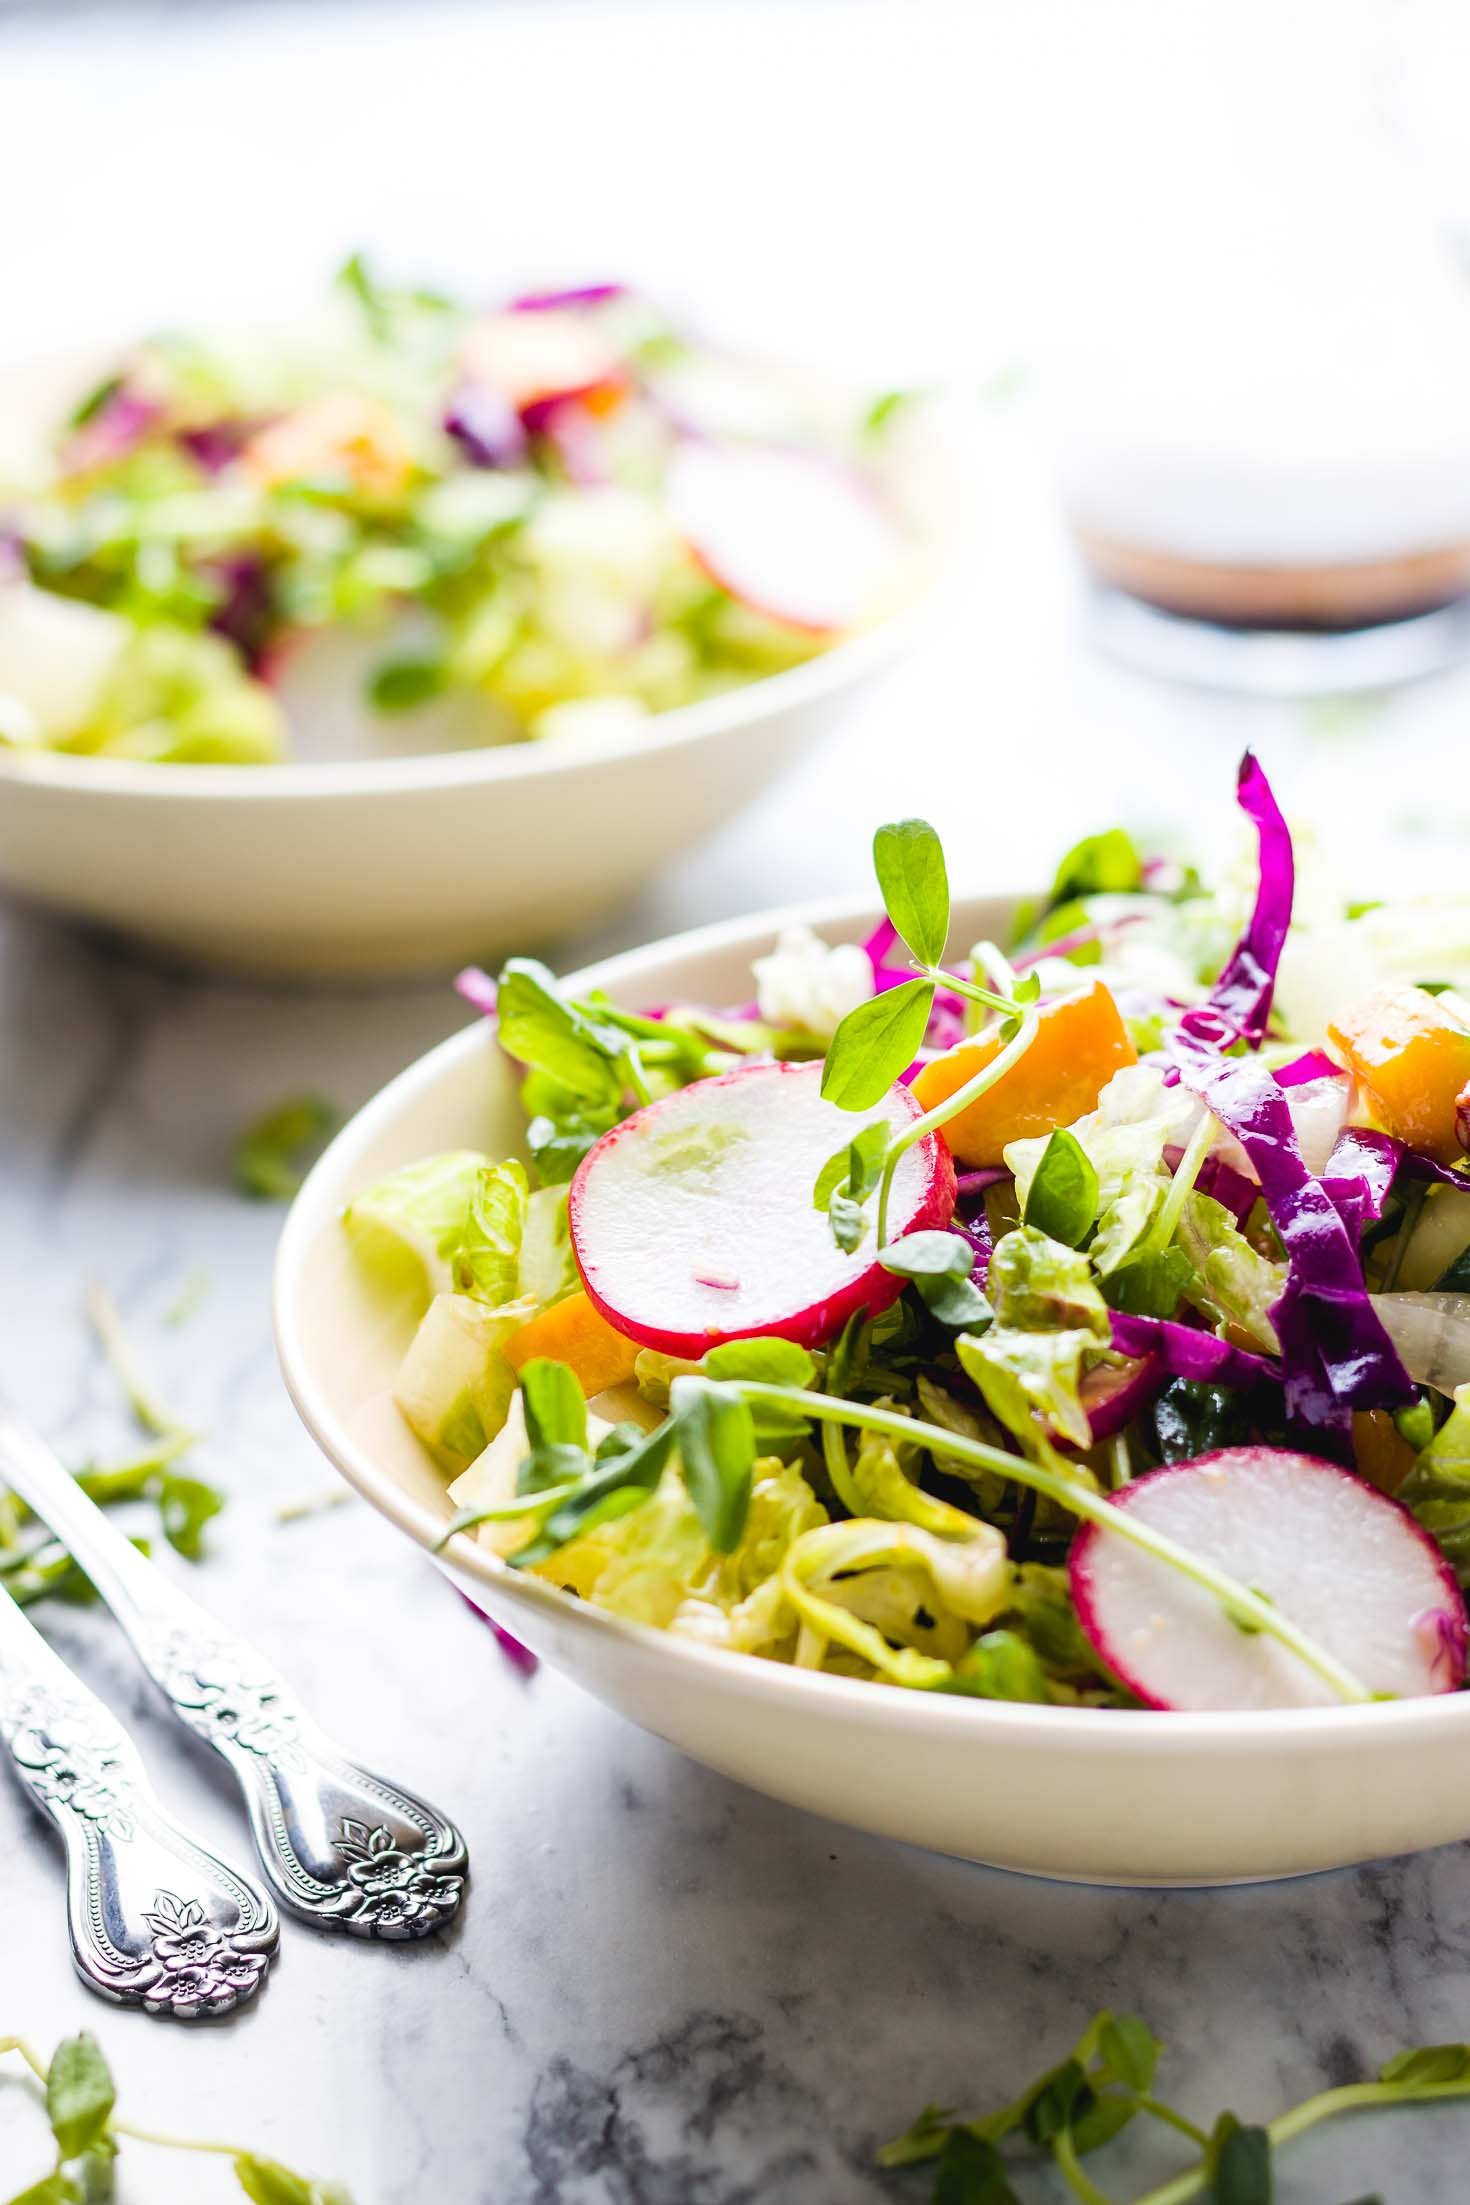 Pea shoots mango rainbow salad-front view-Salad is served in a bowl with balsamic vinargrette. #vegan #salad #peashoot #microgreensalad